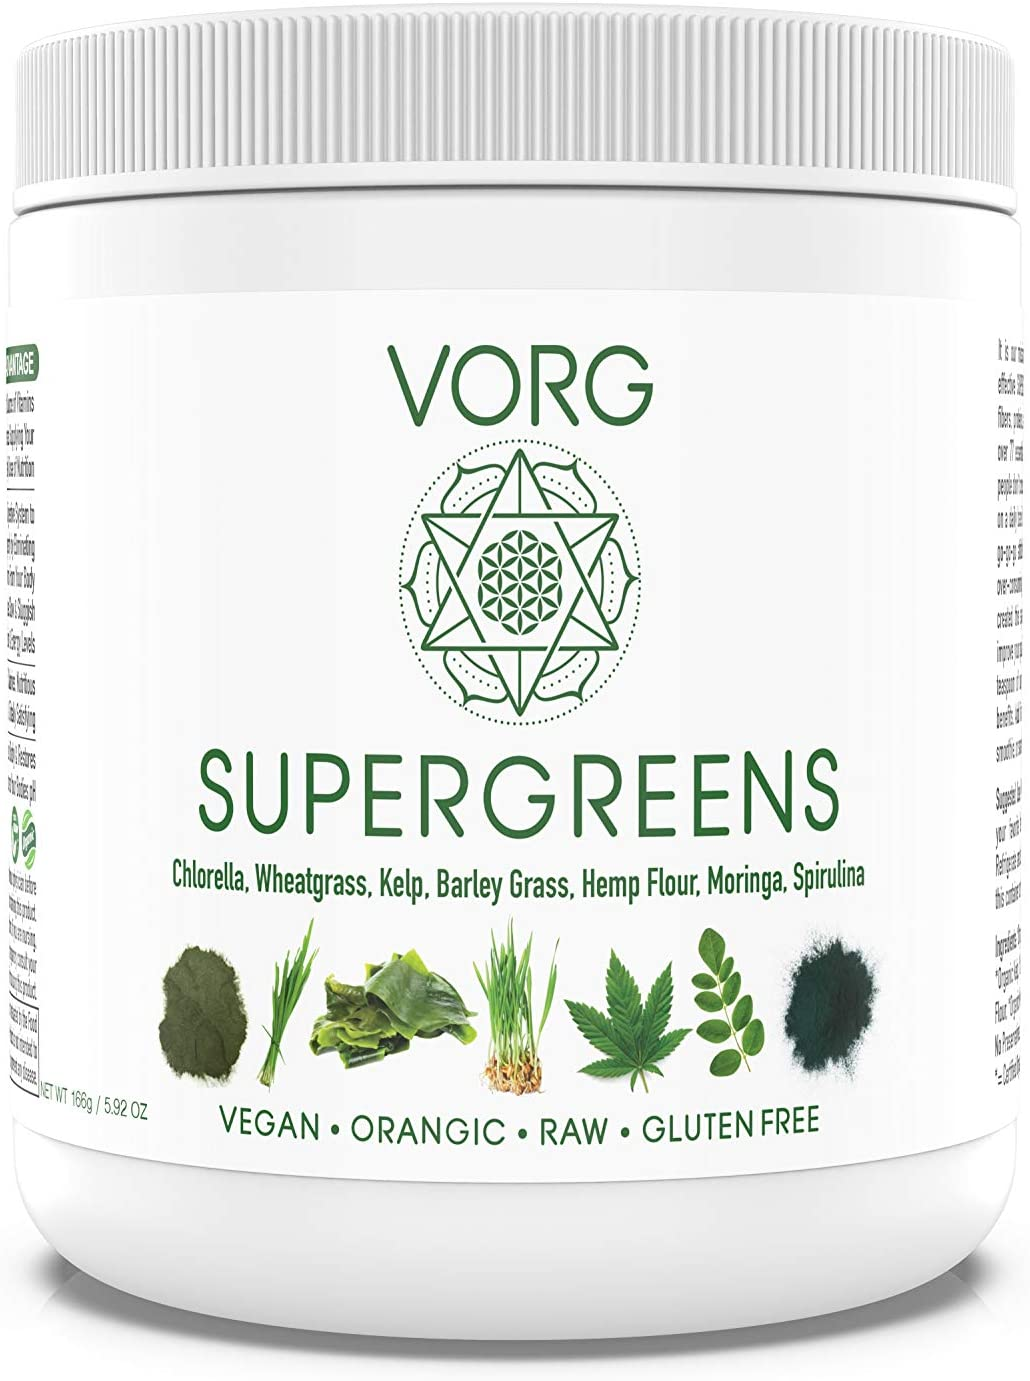 Super VORG SuperGreens - Veggie Powder Superfood Supplement with Chlorella, Barley Grass, Moringa, Hemp Flour, Kelp, Spirulina, Wheatgrass - Natural Organic Ingredients, No Soy or Gluten - 33 Servings